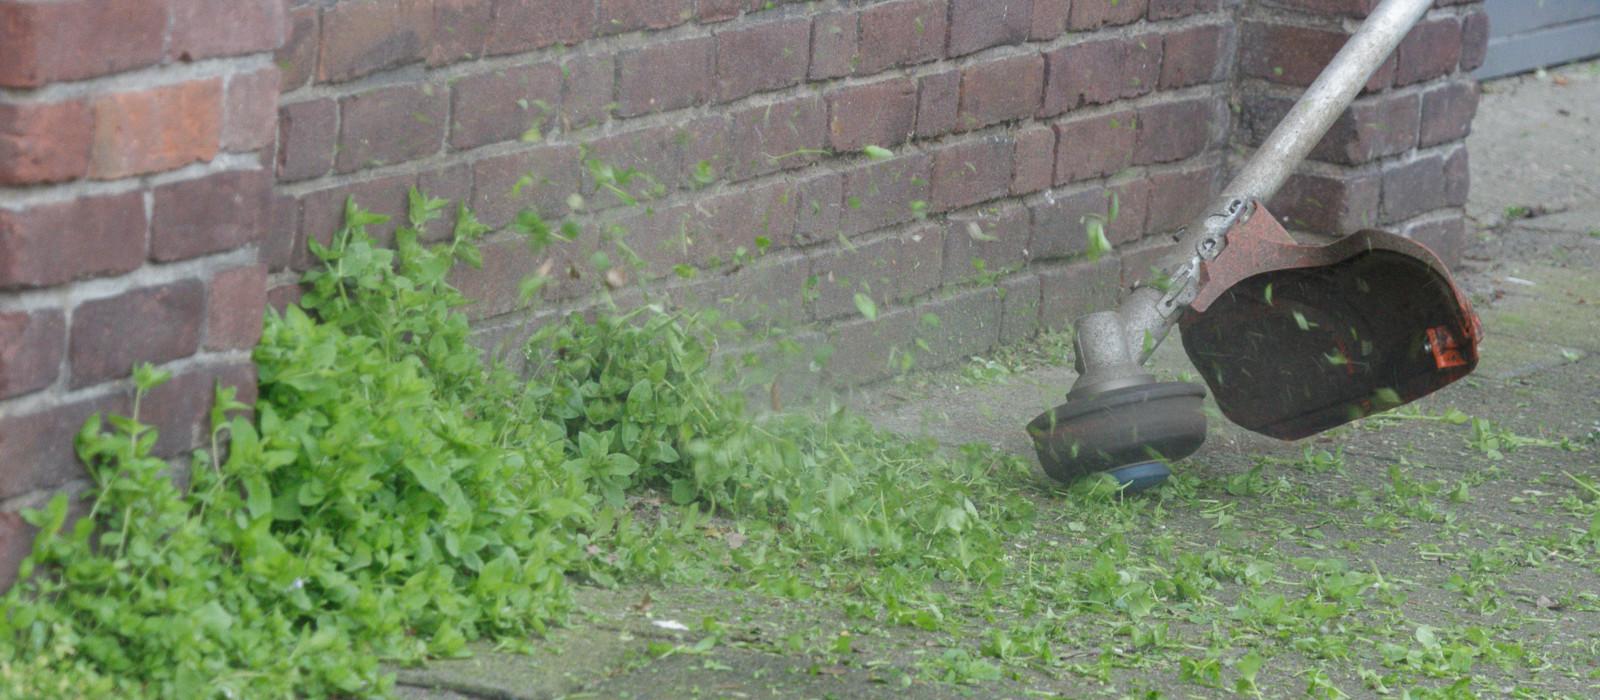 Groeizaam weer: extra inspanning onkruidbeheersing